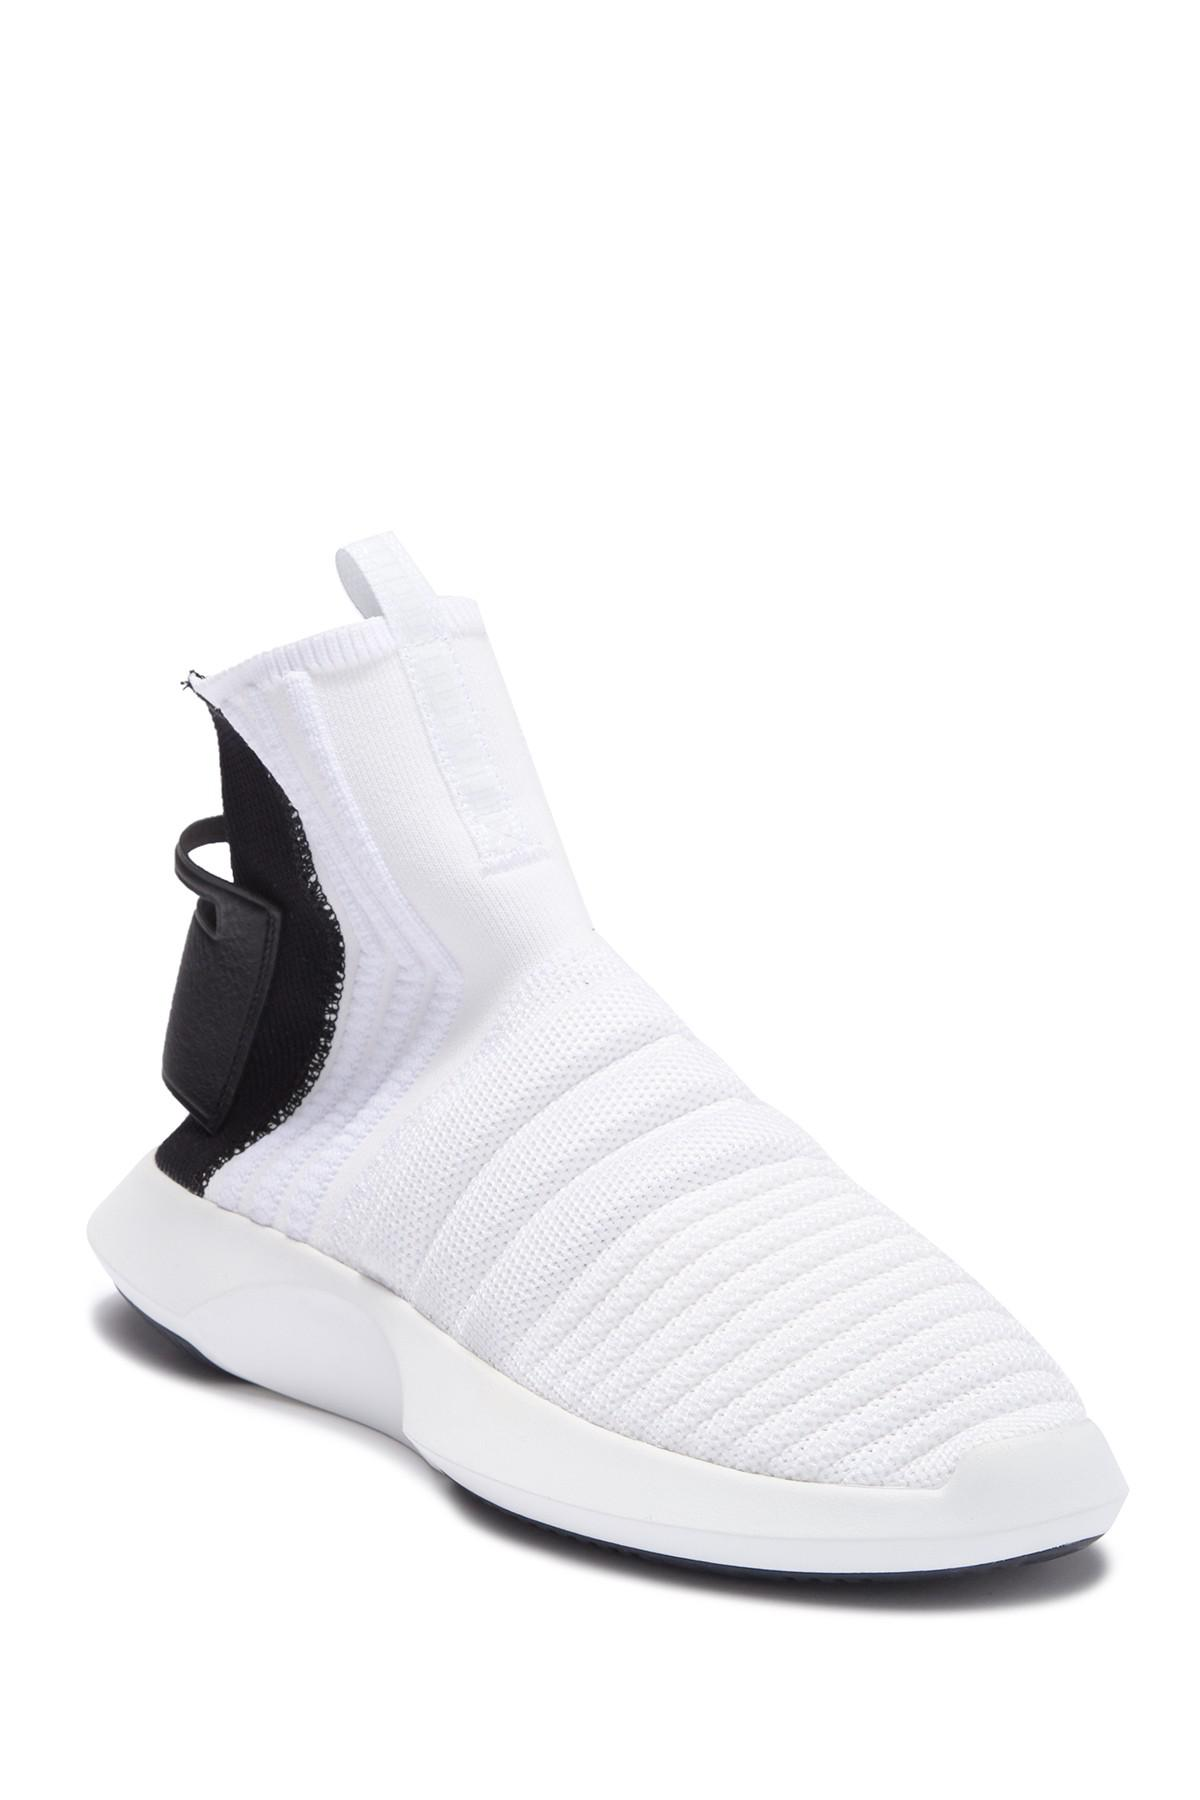 competitive price bbd95 77794 adidas. Mens White Crazy 1 Adv ...